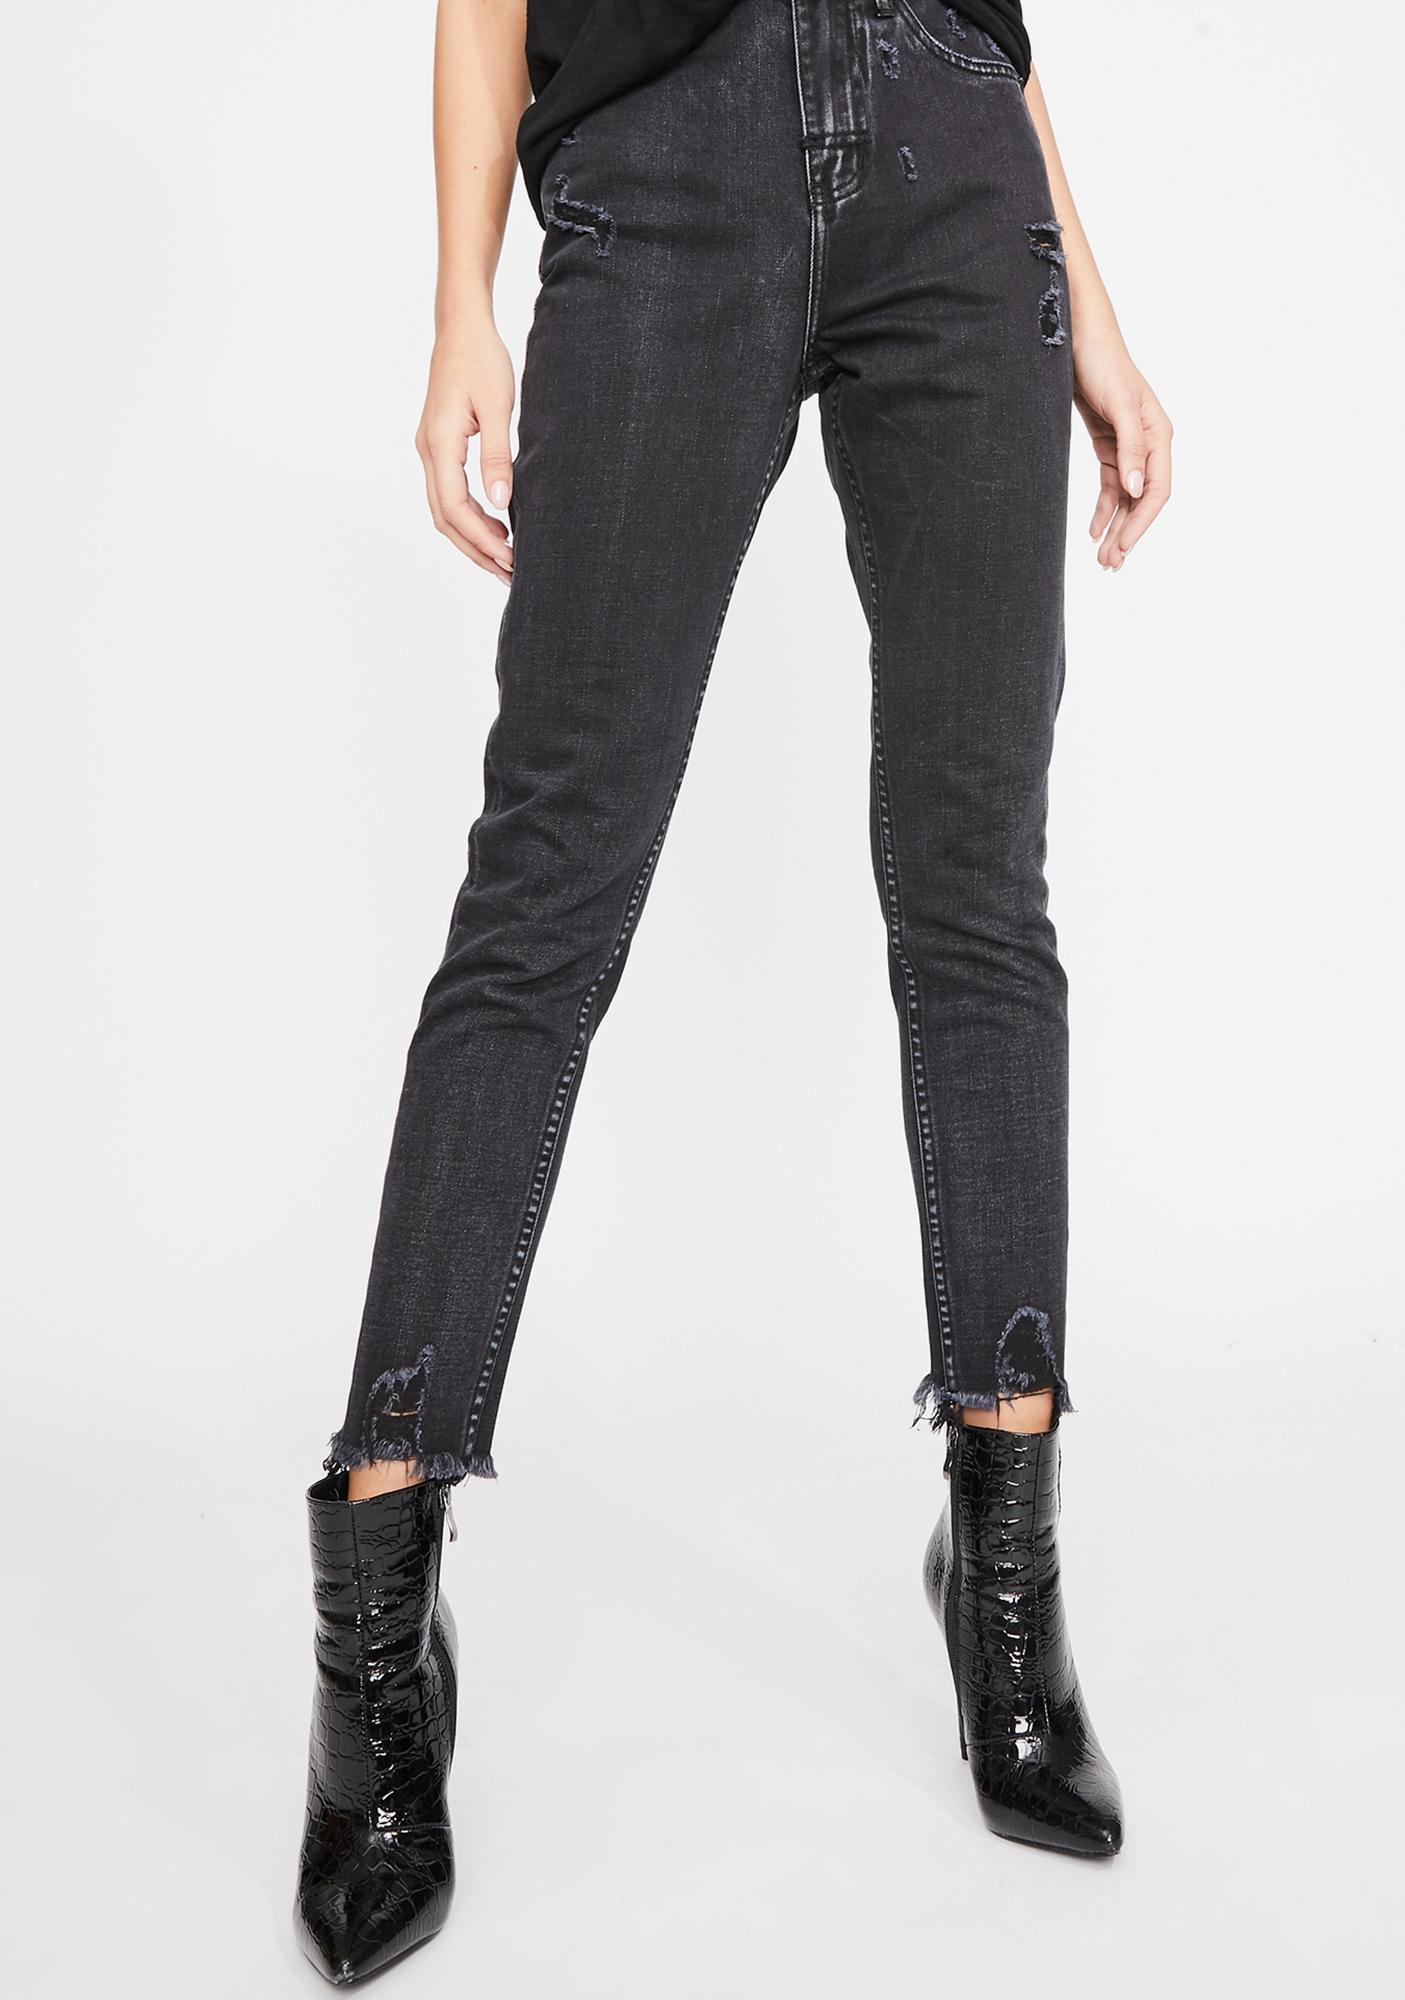 The People VS High Waist Mum Jeans